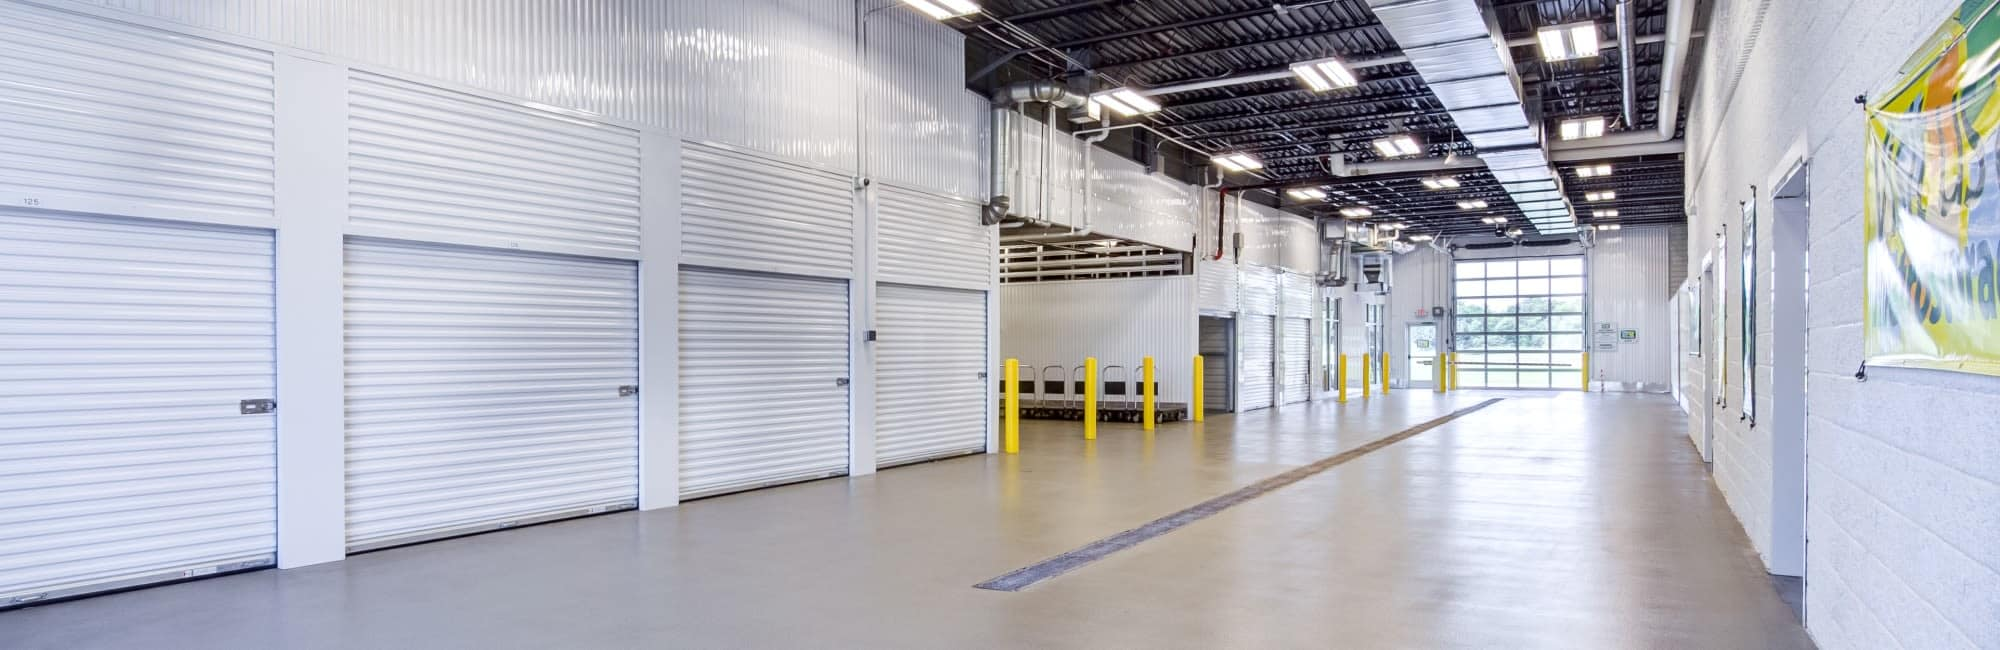 Metro Self Storage in Blaine, MN